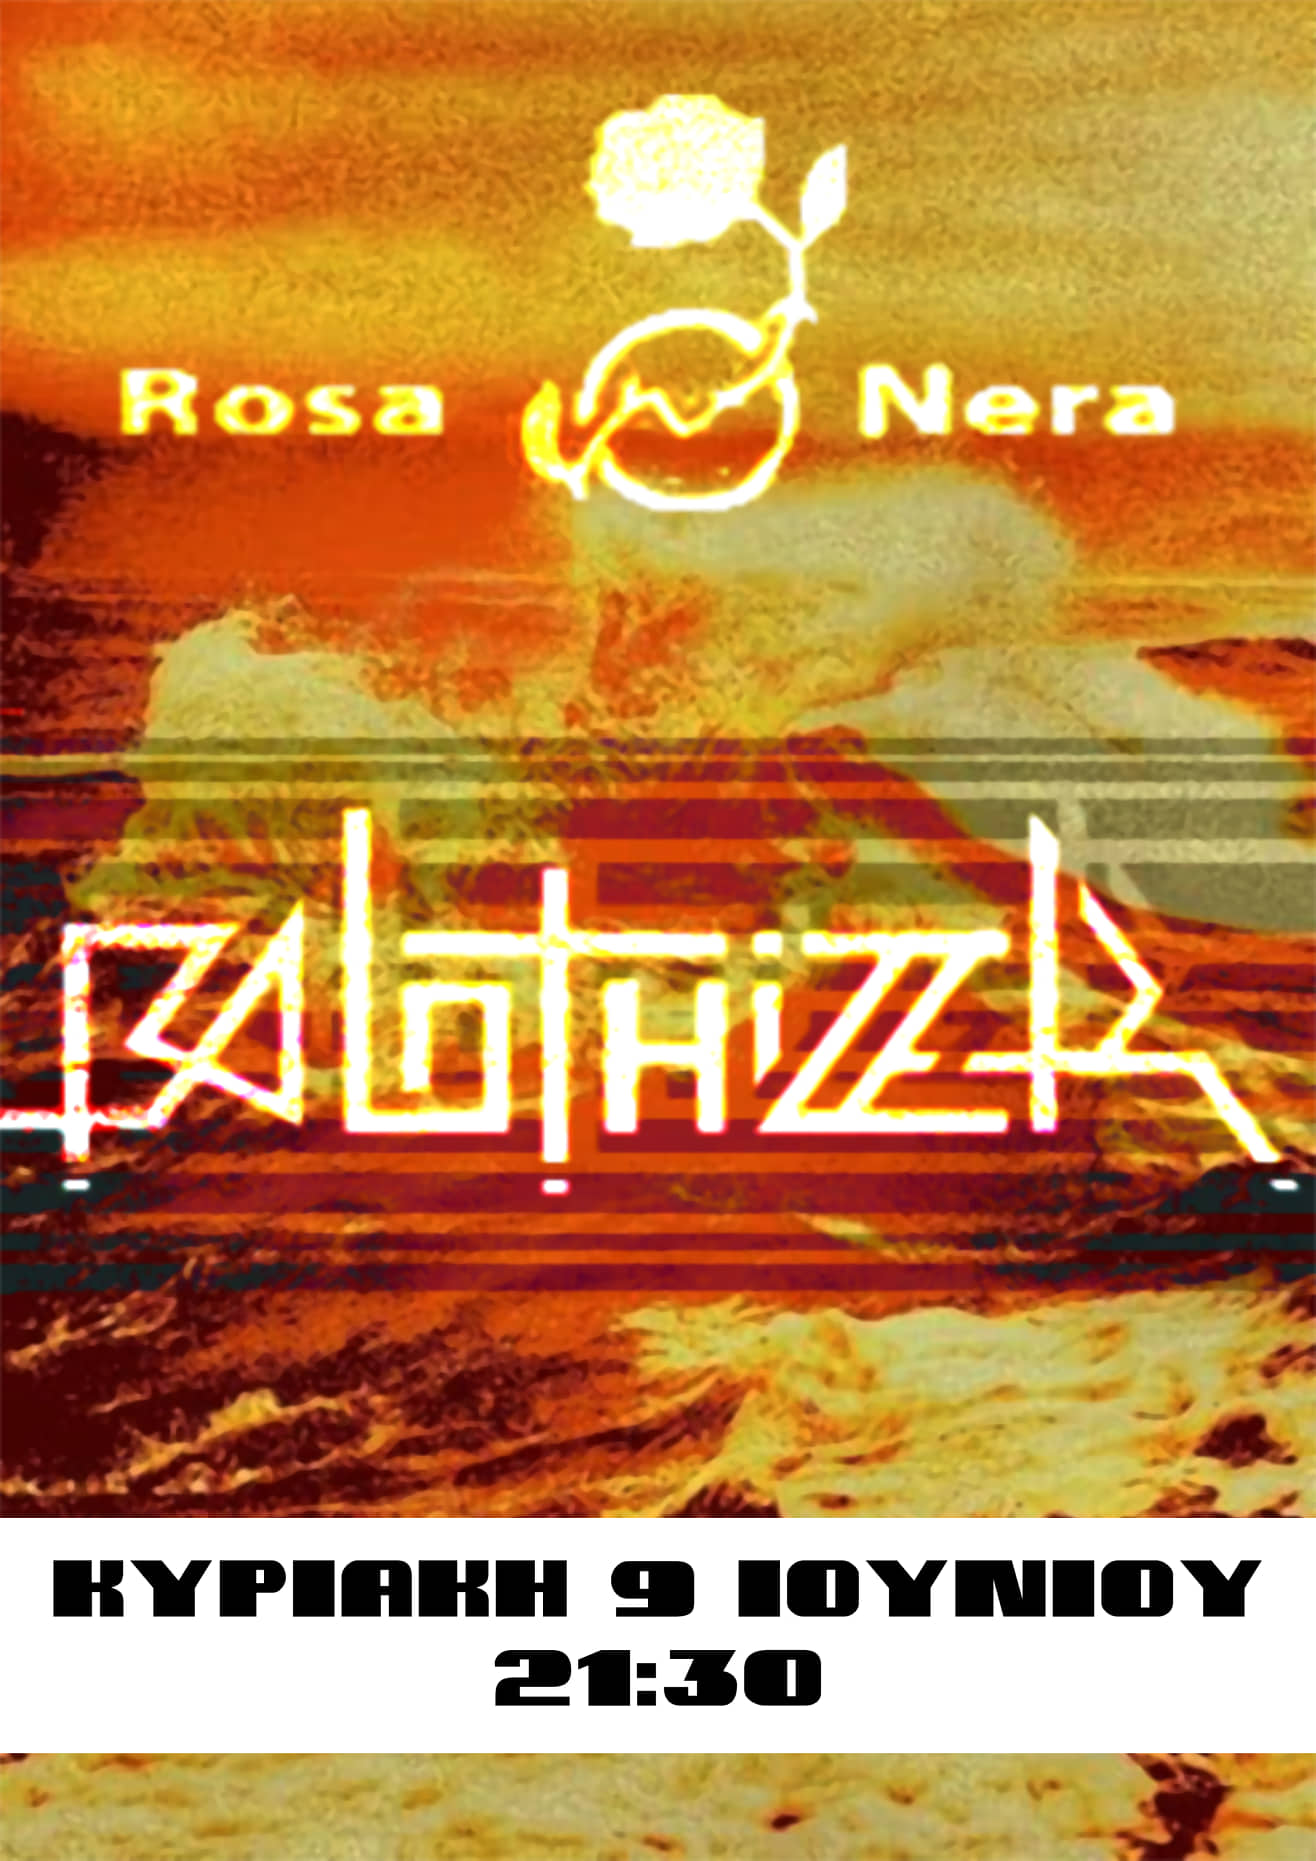 Balothizer live την Κυριακή 9 Ιούνη